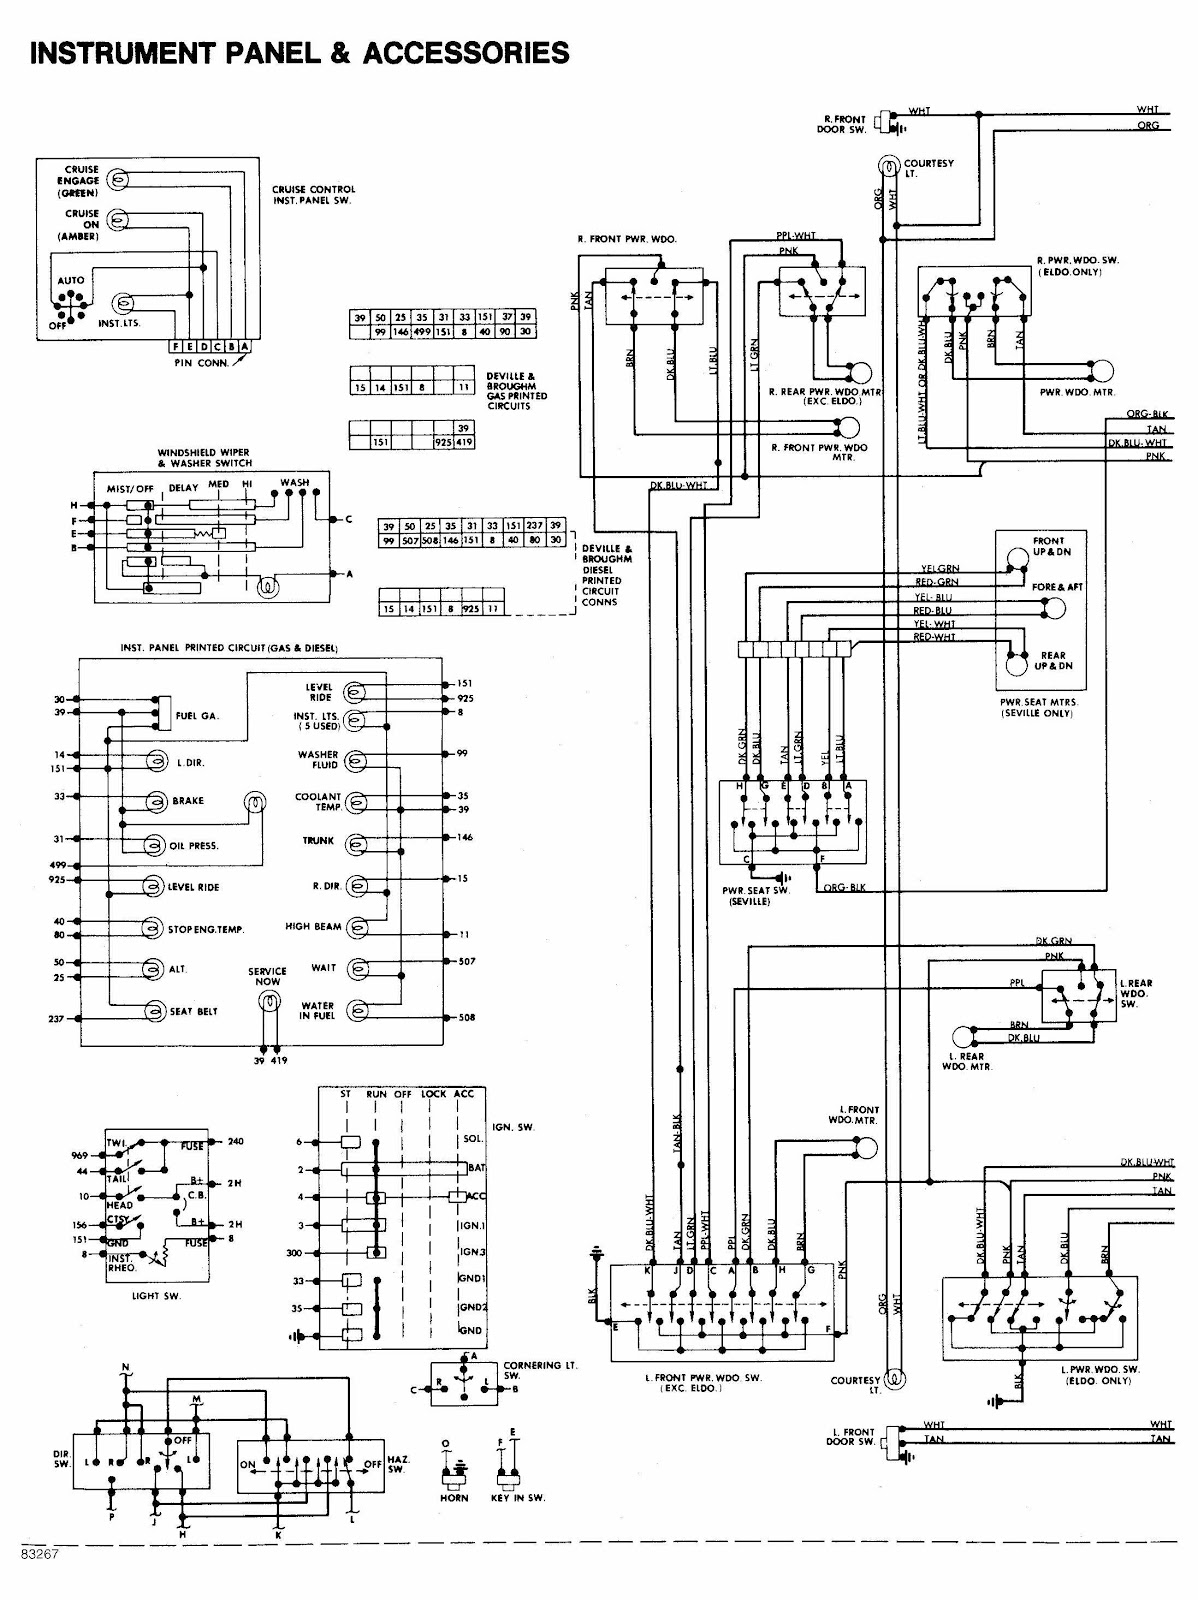 small resolution of 1967 mustang instrument cluster wiring diagram 94 mustang 1966 mustang wiring diagram 1967 mustang alternator wiring